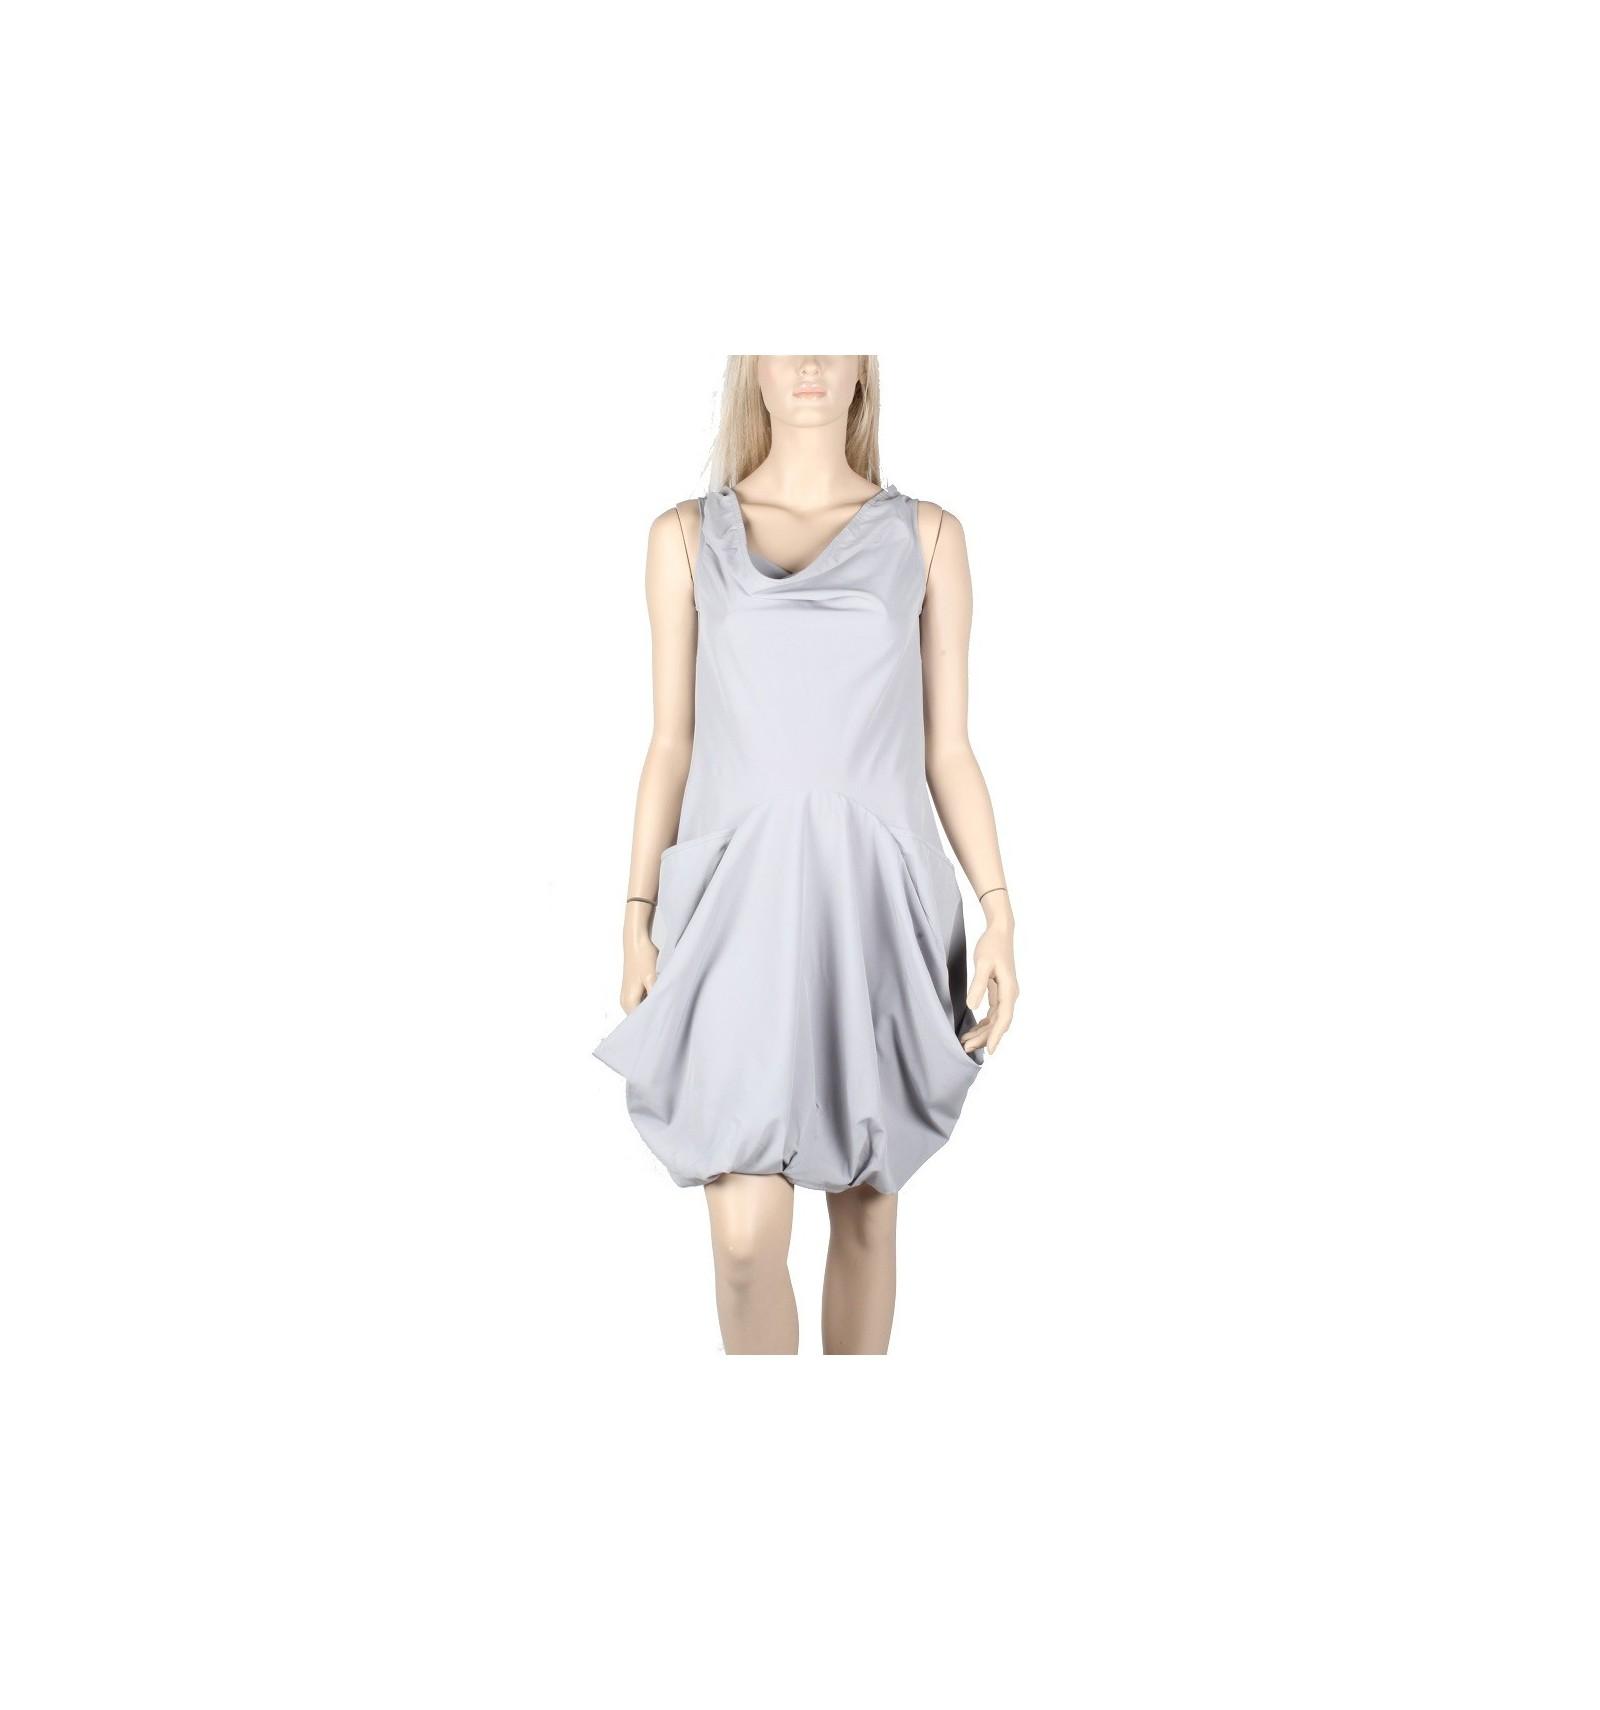 Sleeveless dress maloka grey \